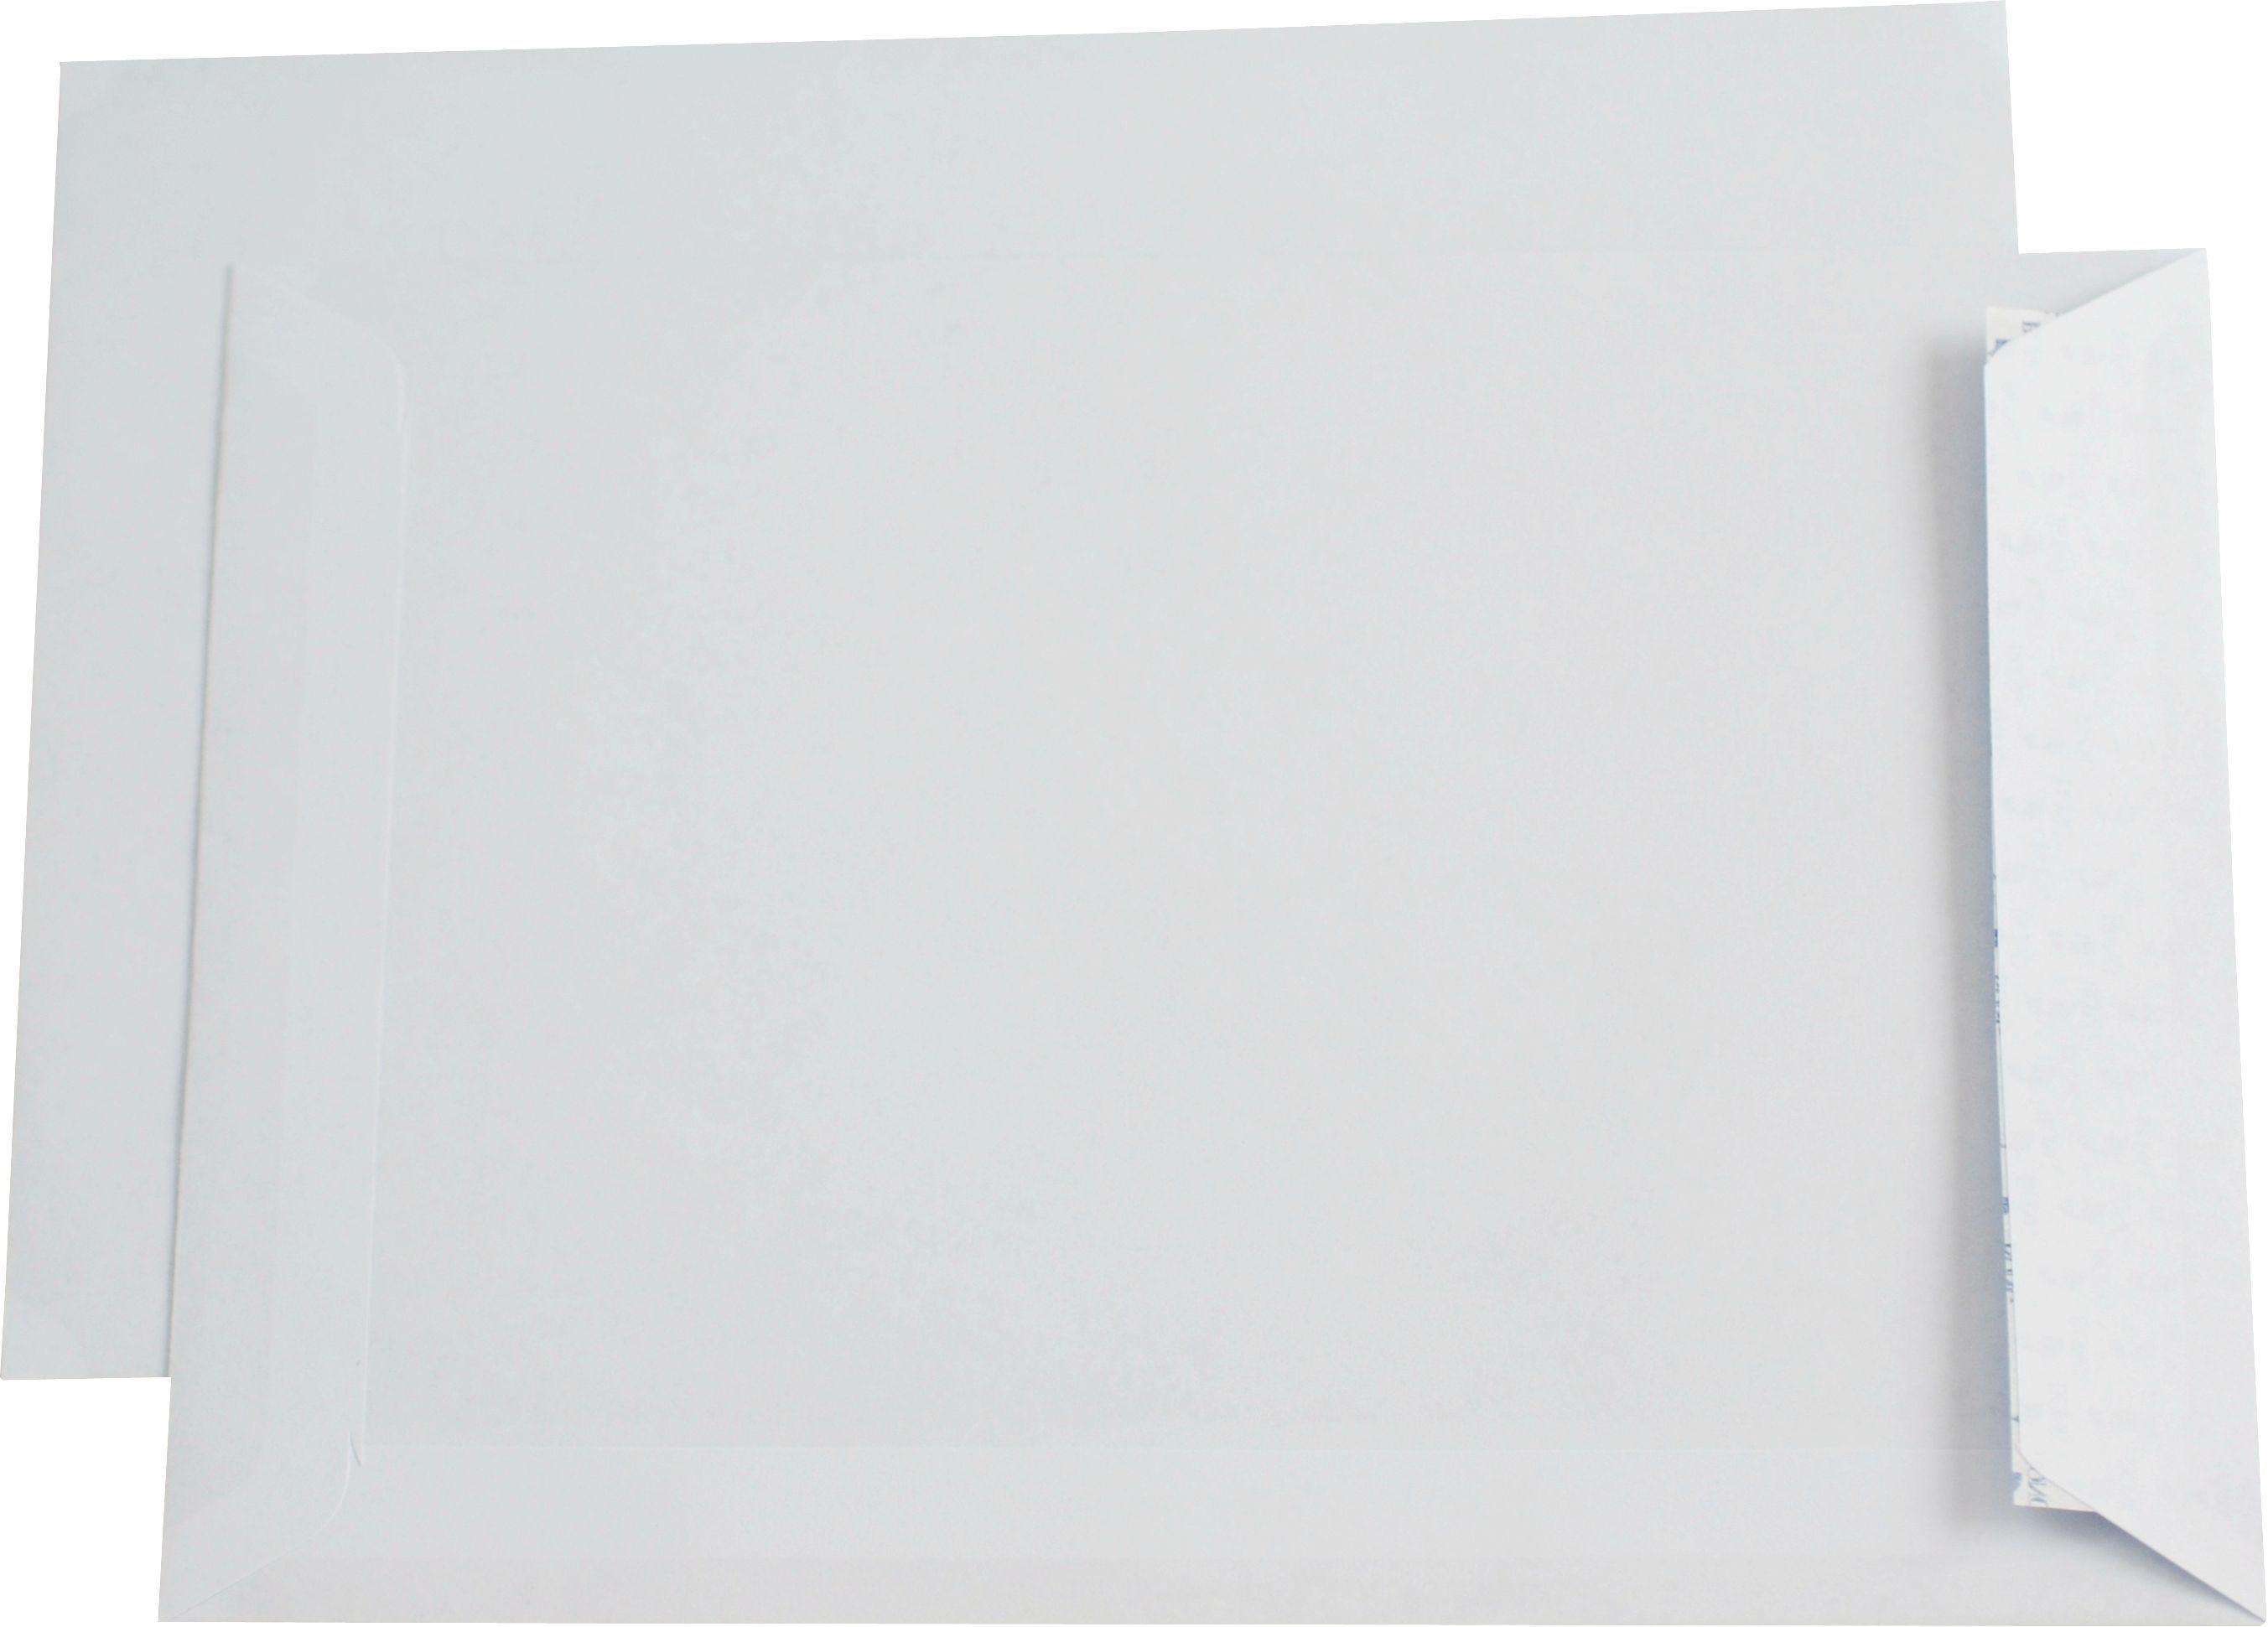 Mailman Konvolutt C5 90g pose SKD (500) 10103